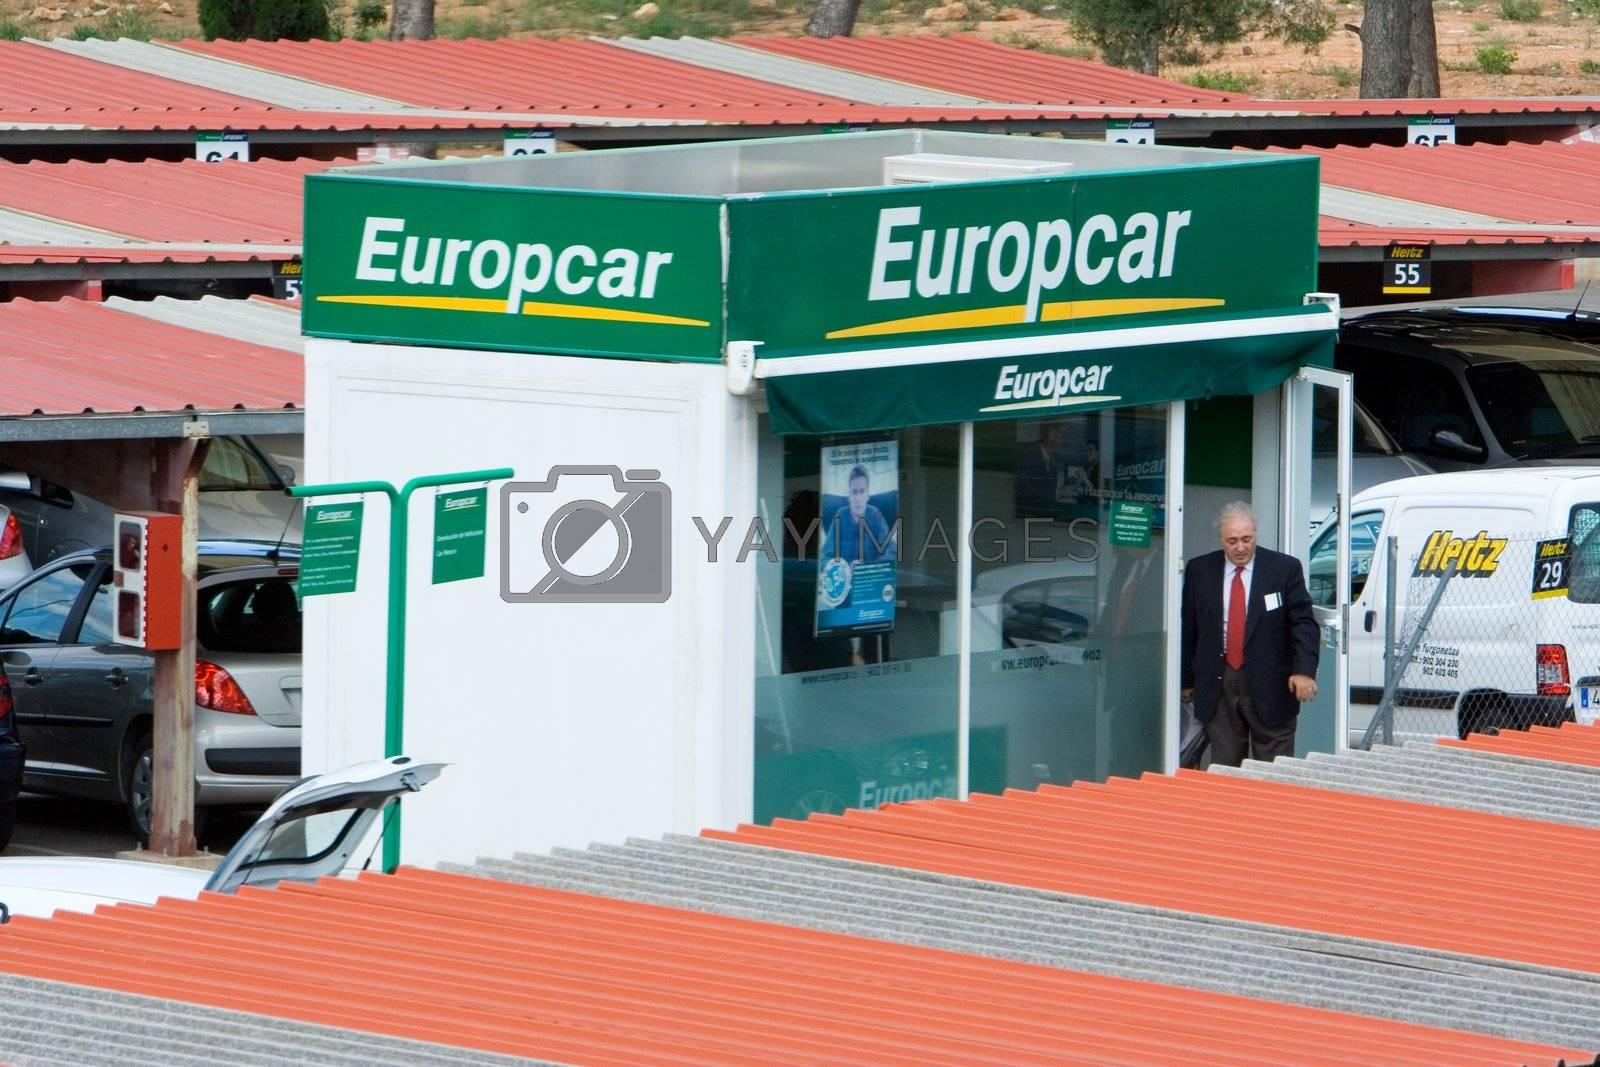 Europcar in Valencia, Spain airport